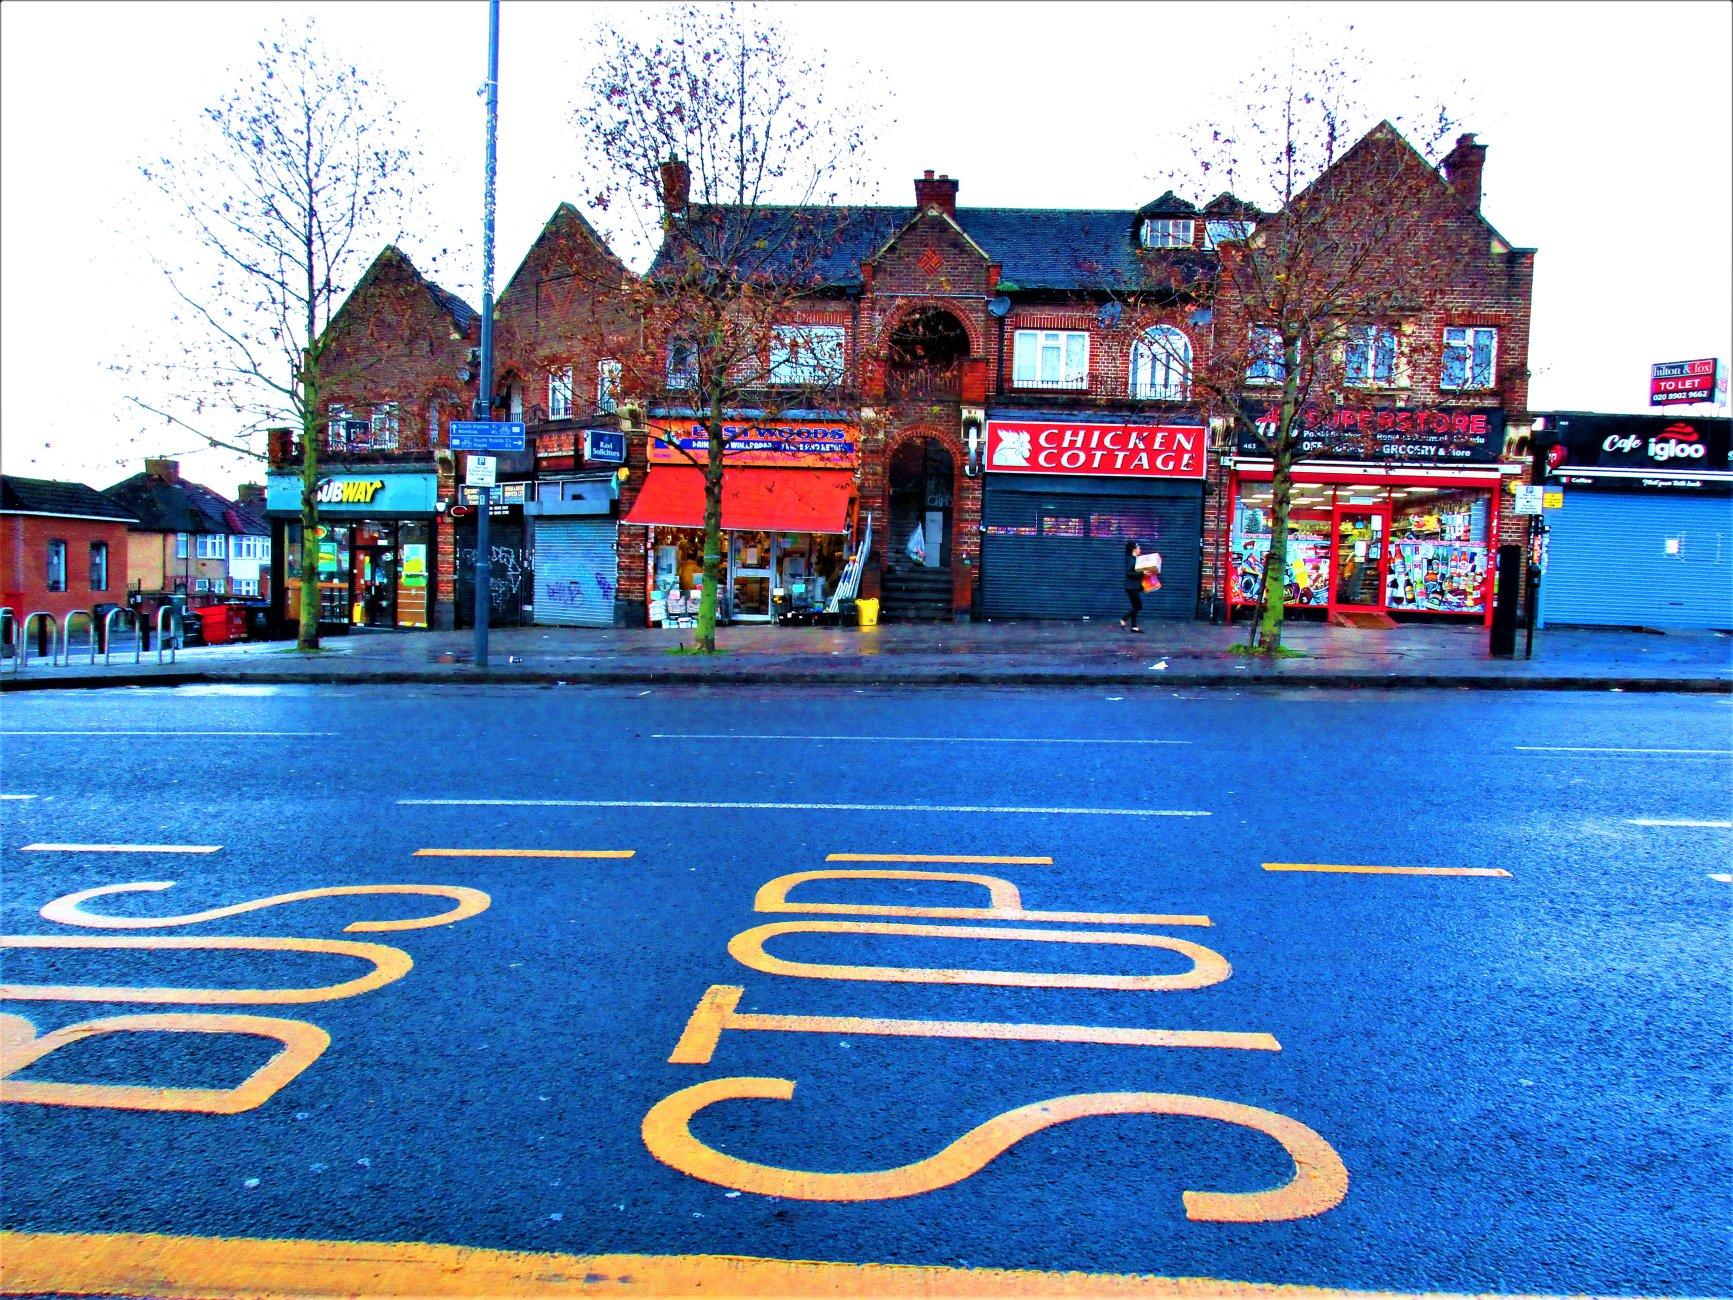 Bus Stop #2